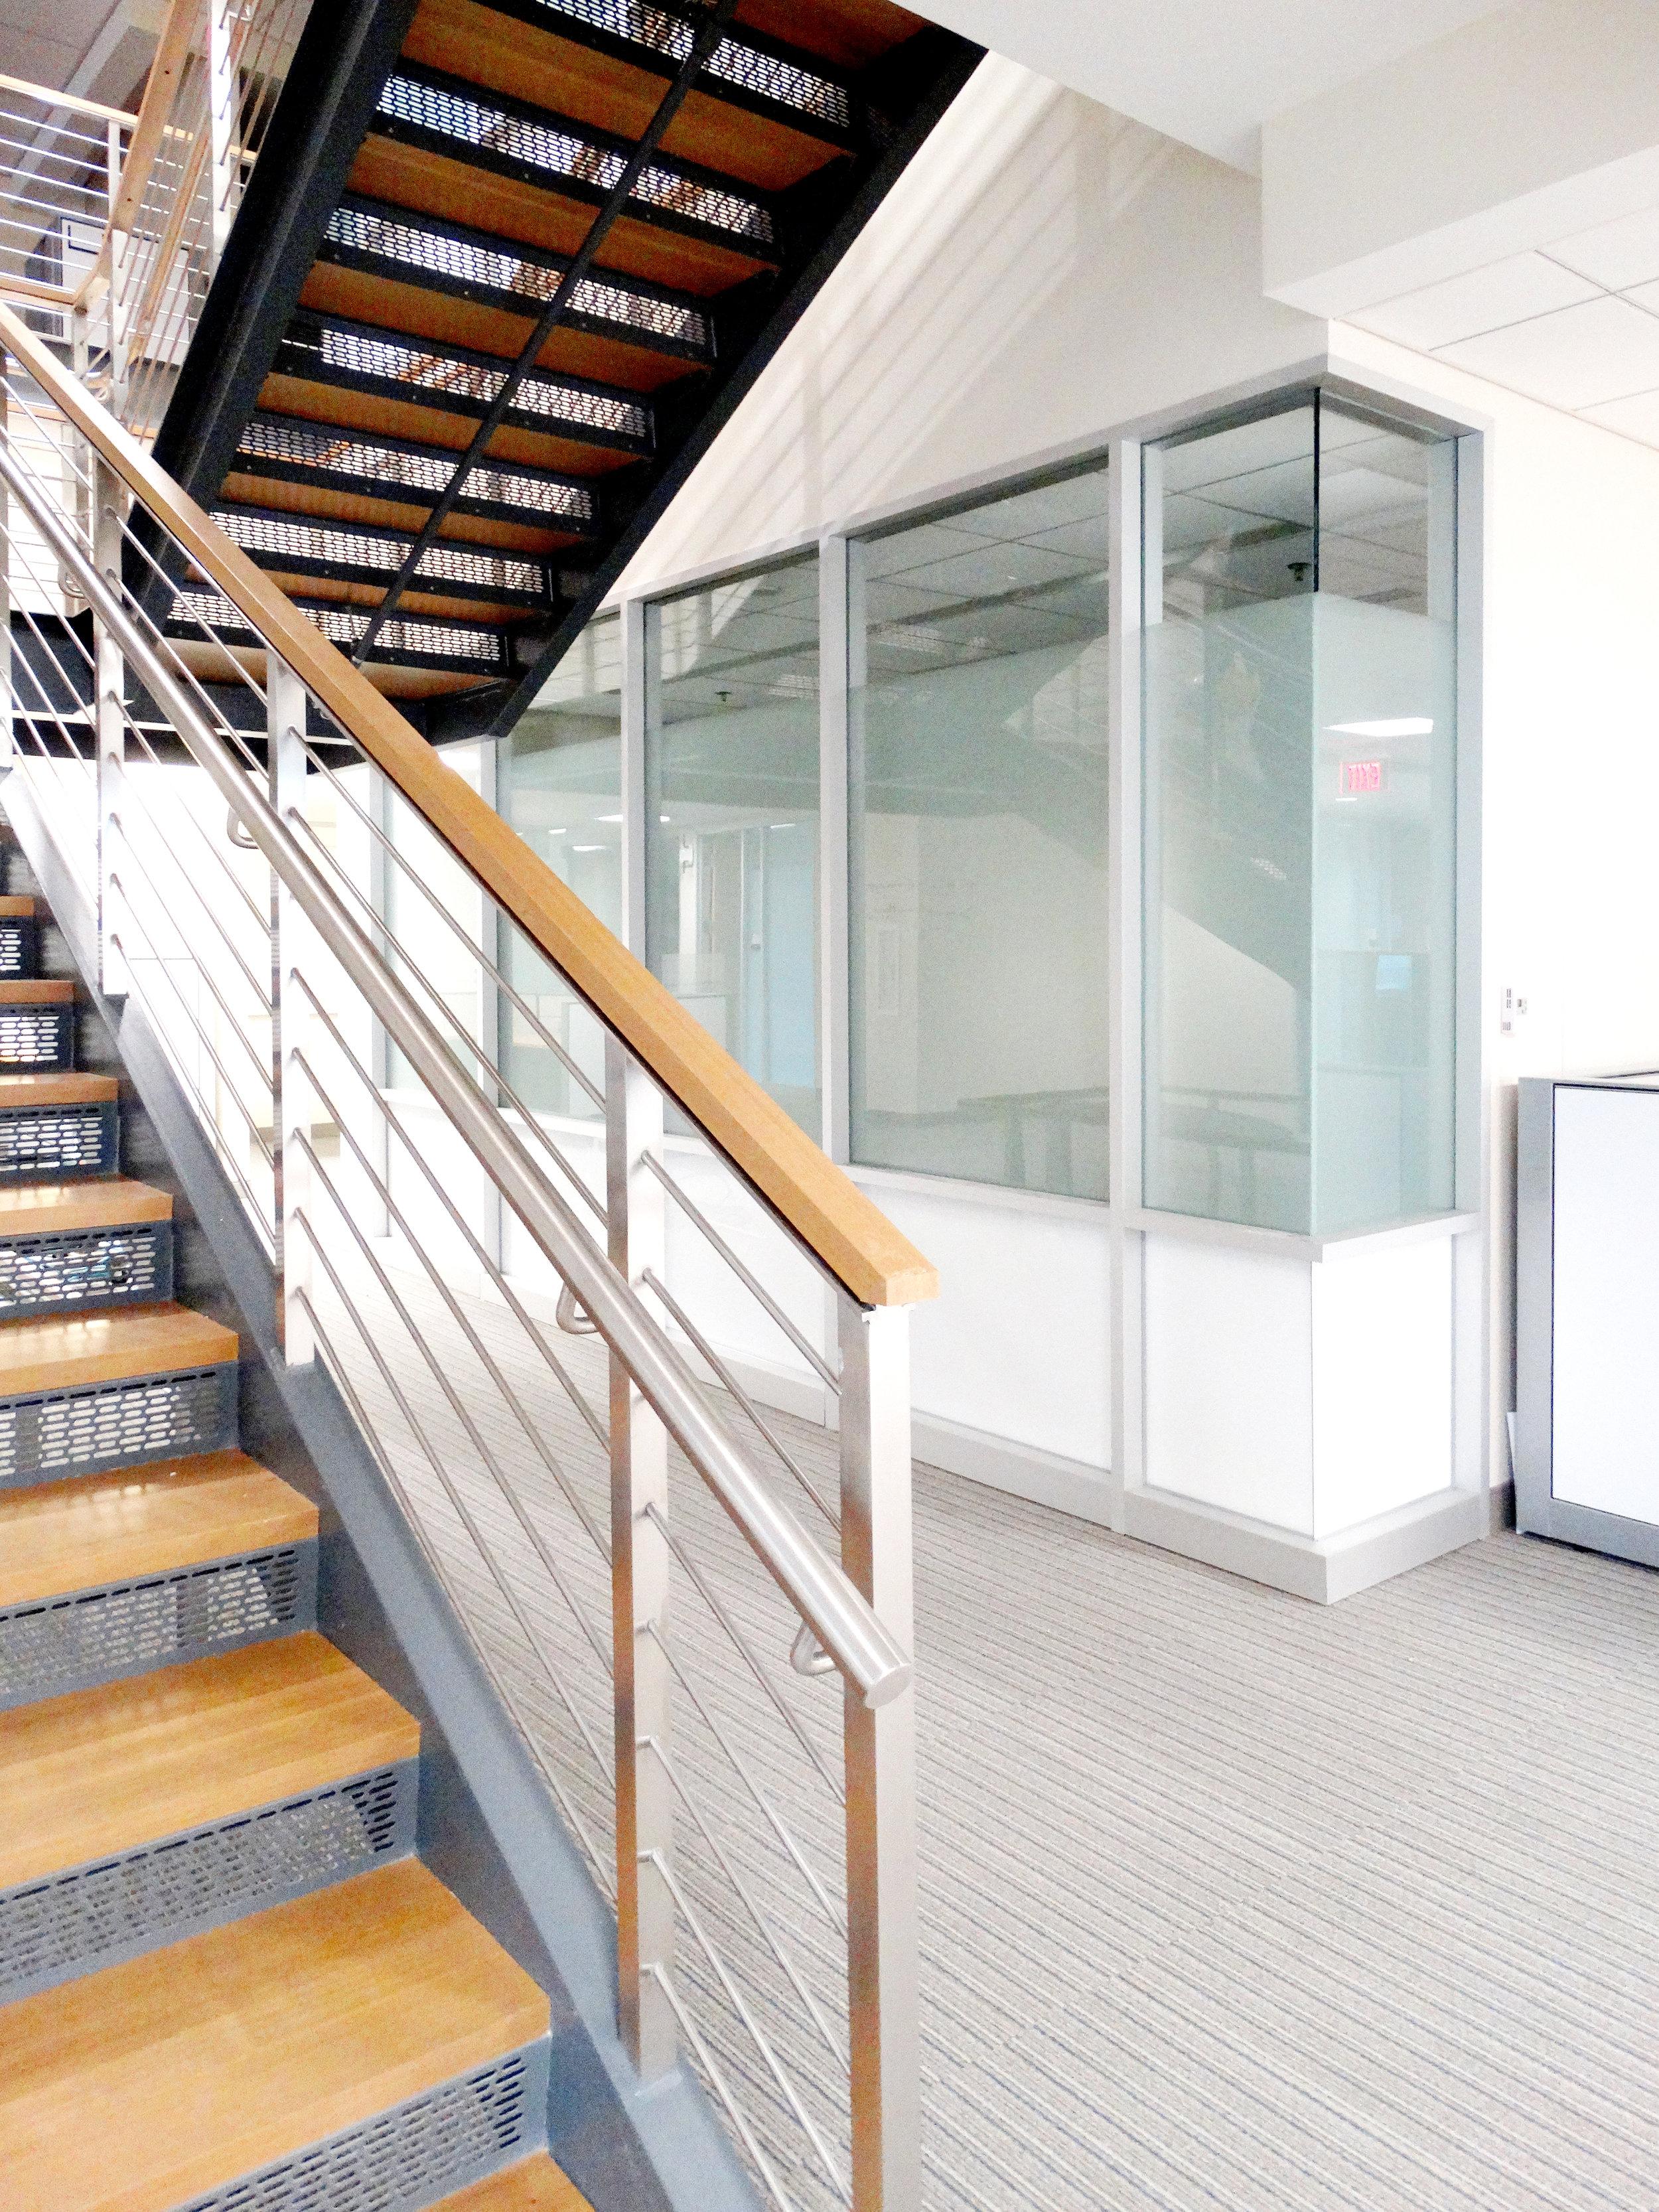 Encase Specialty Glass Wall System - Spaceworks AI.jpg